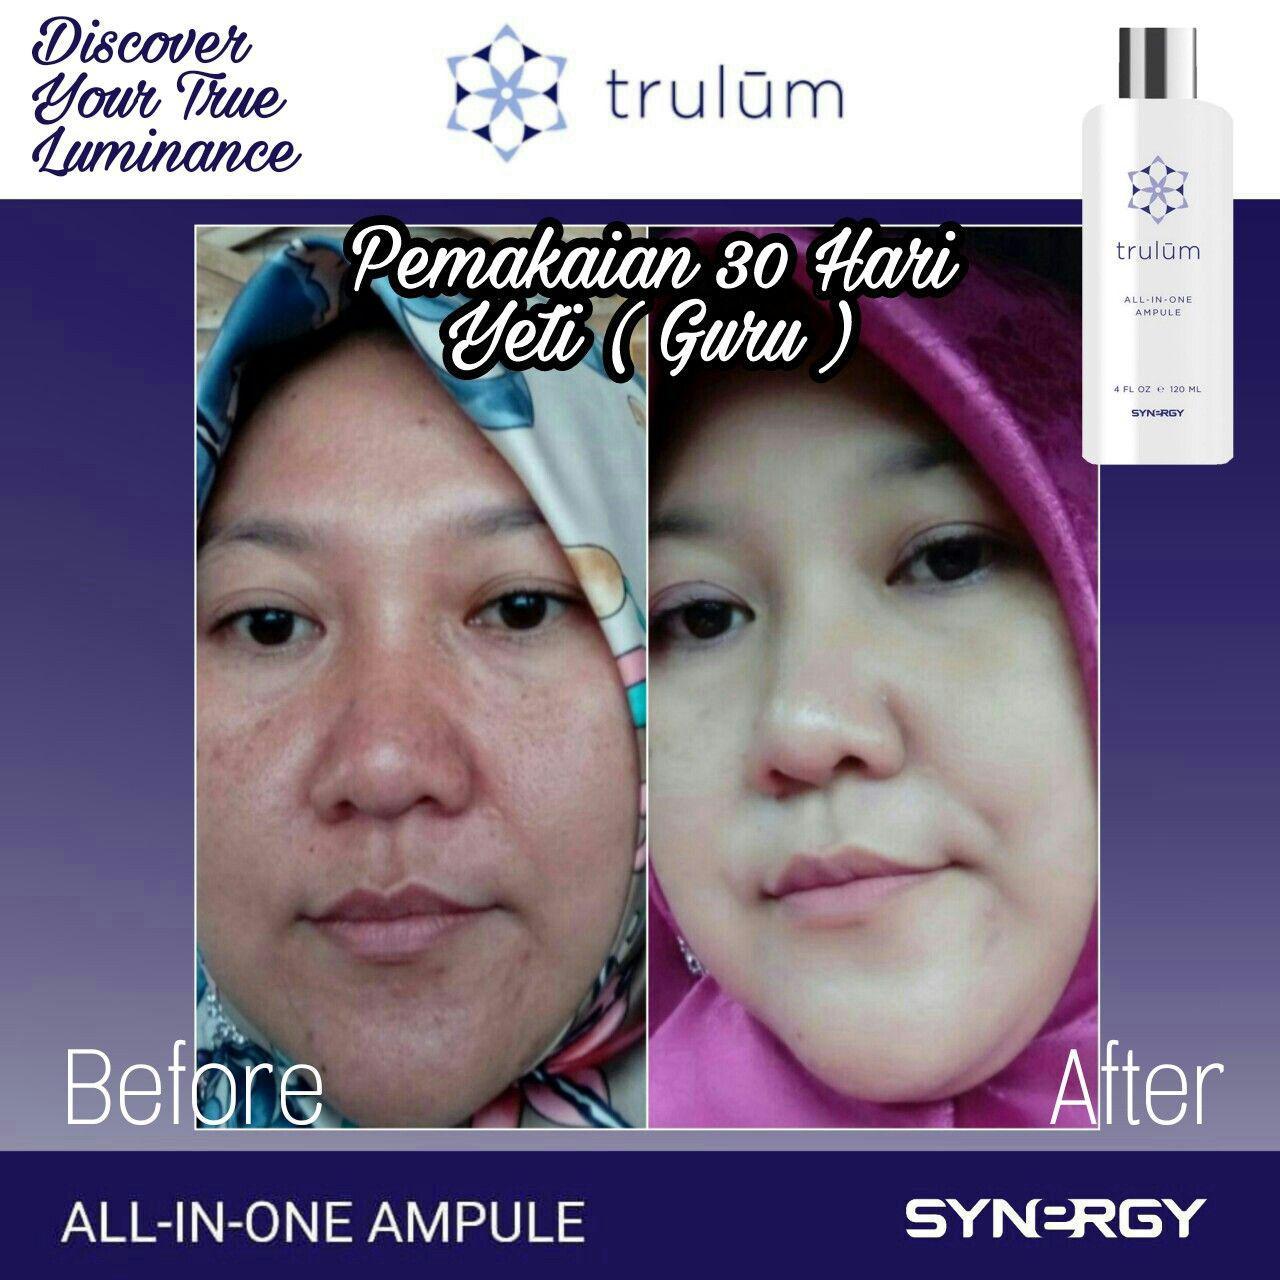 Klinik Kecantikan Trulum Dari Synergy Di Sigumpar, Toba Samosir WA: 08112338376